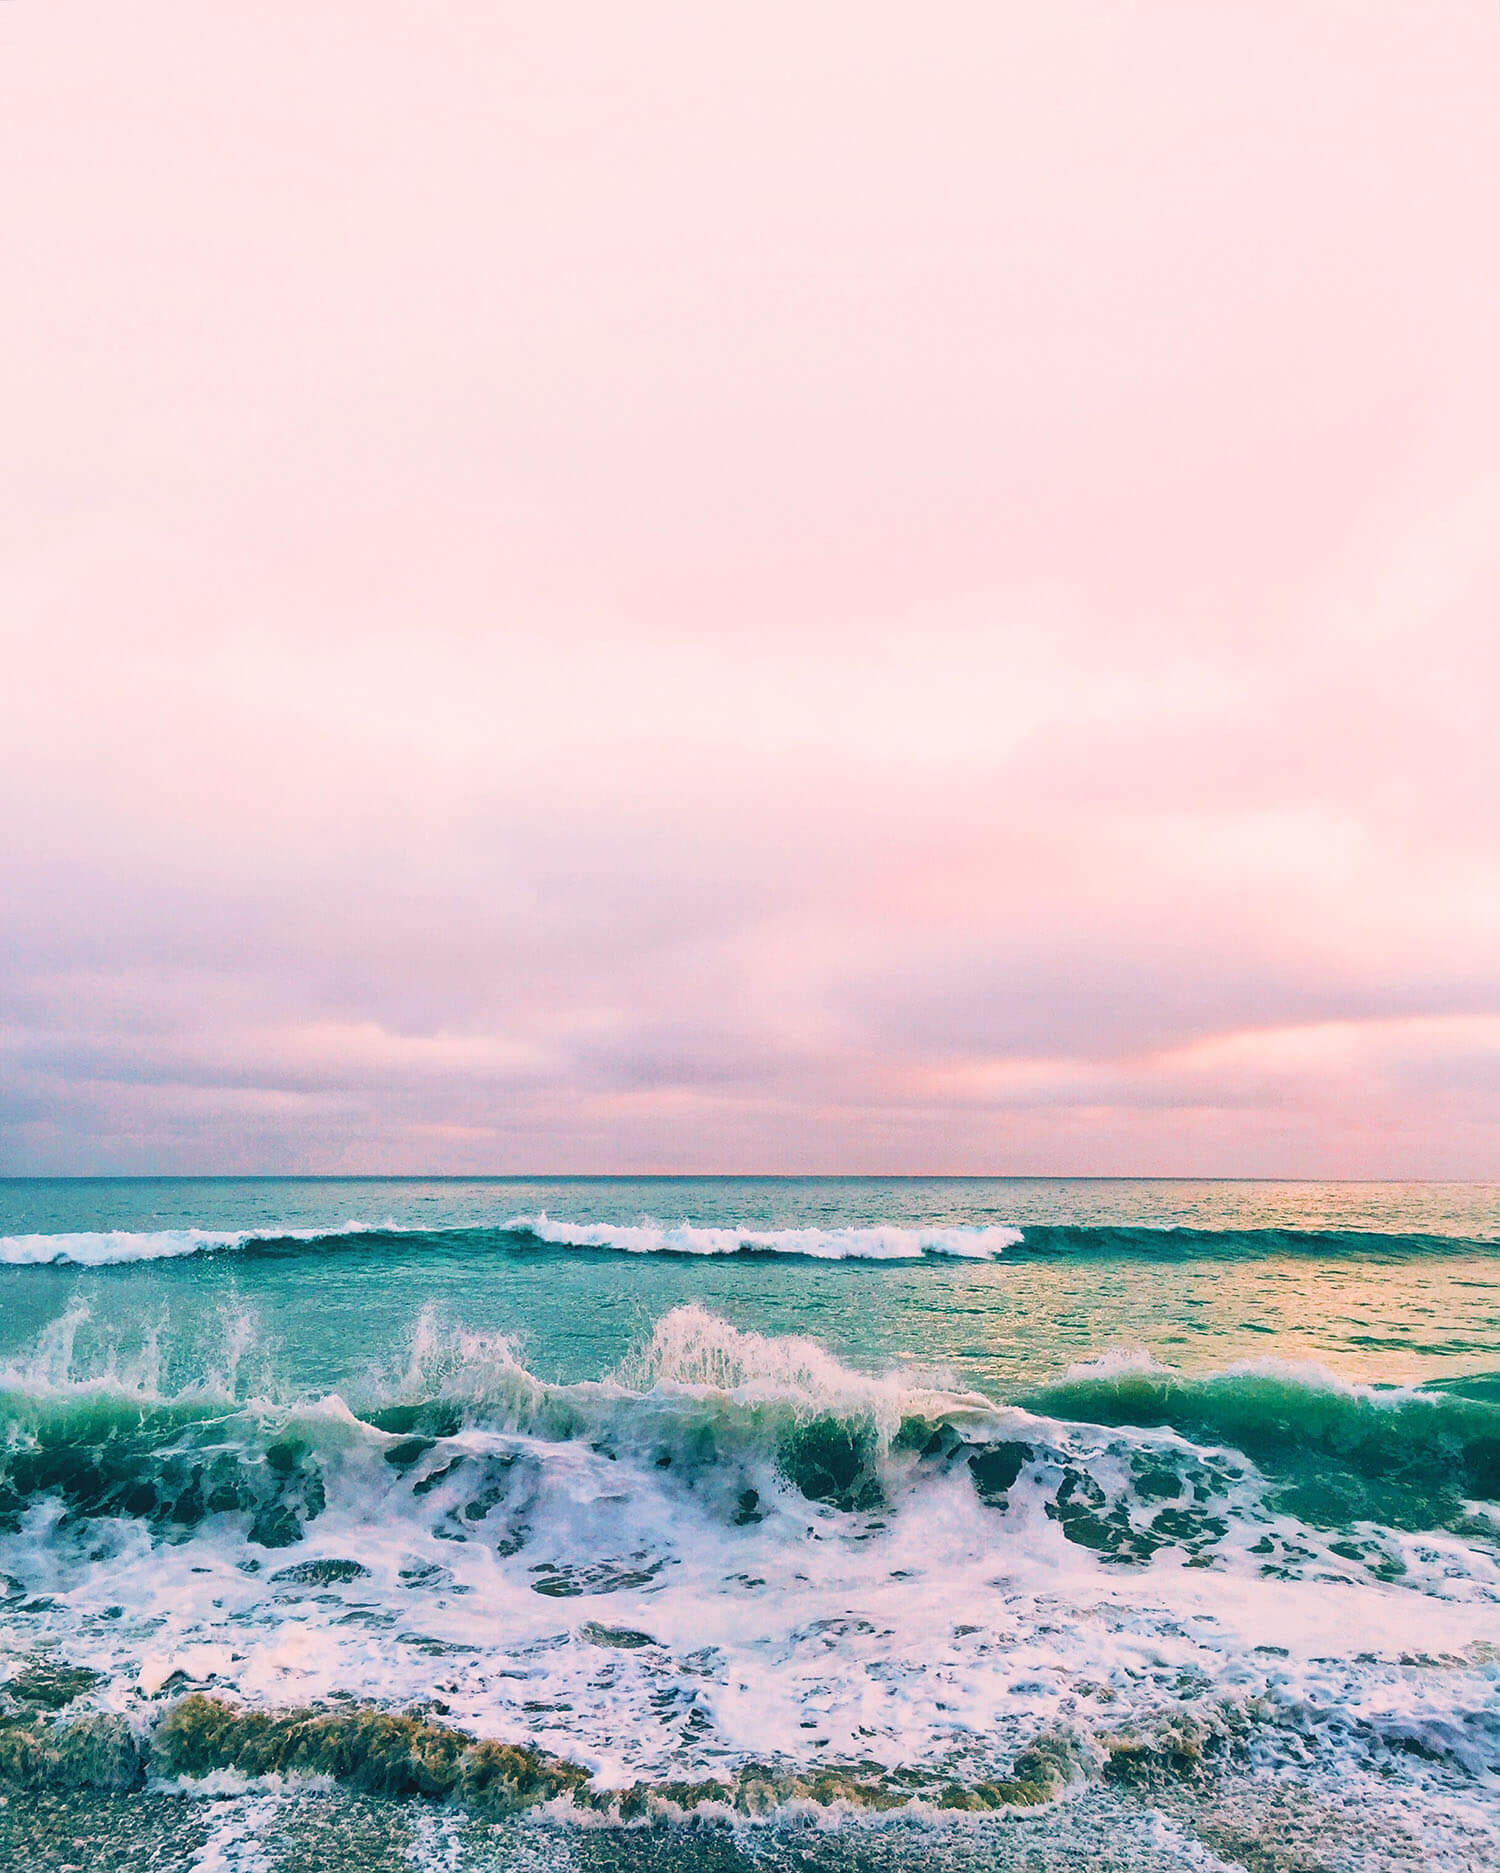 Cali waves